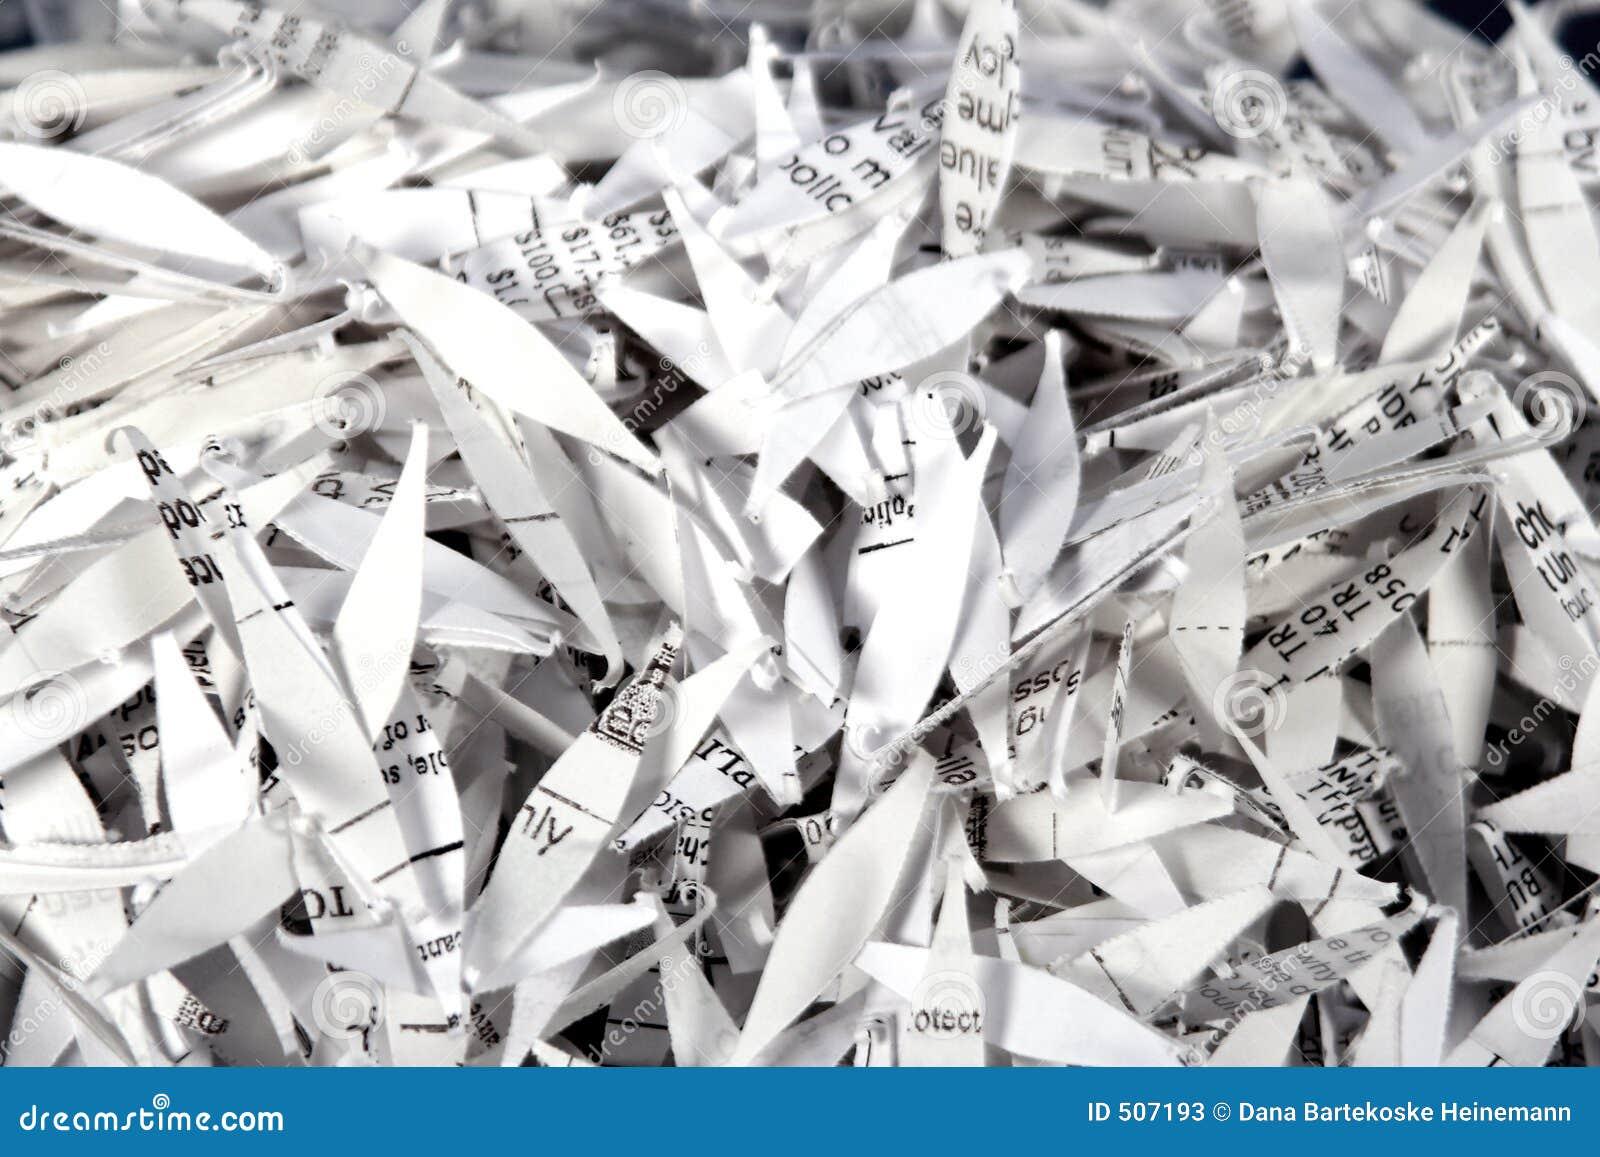 paper shredding terms